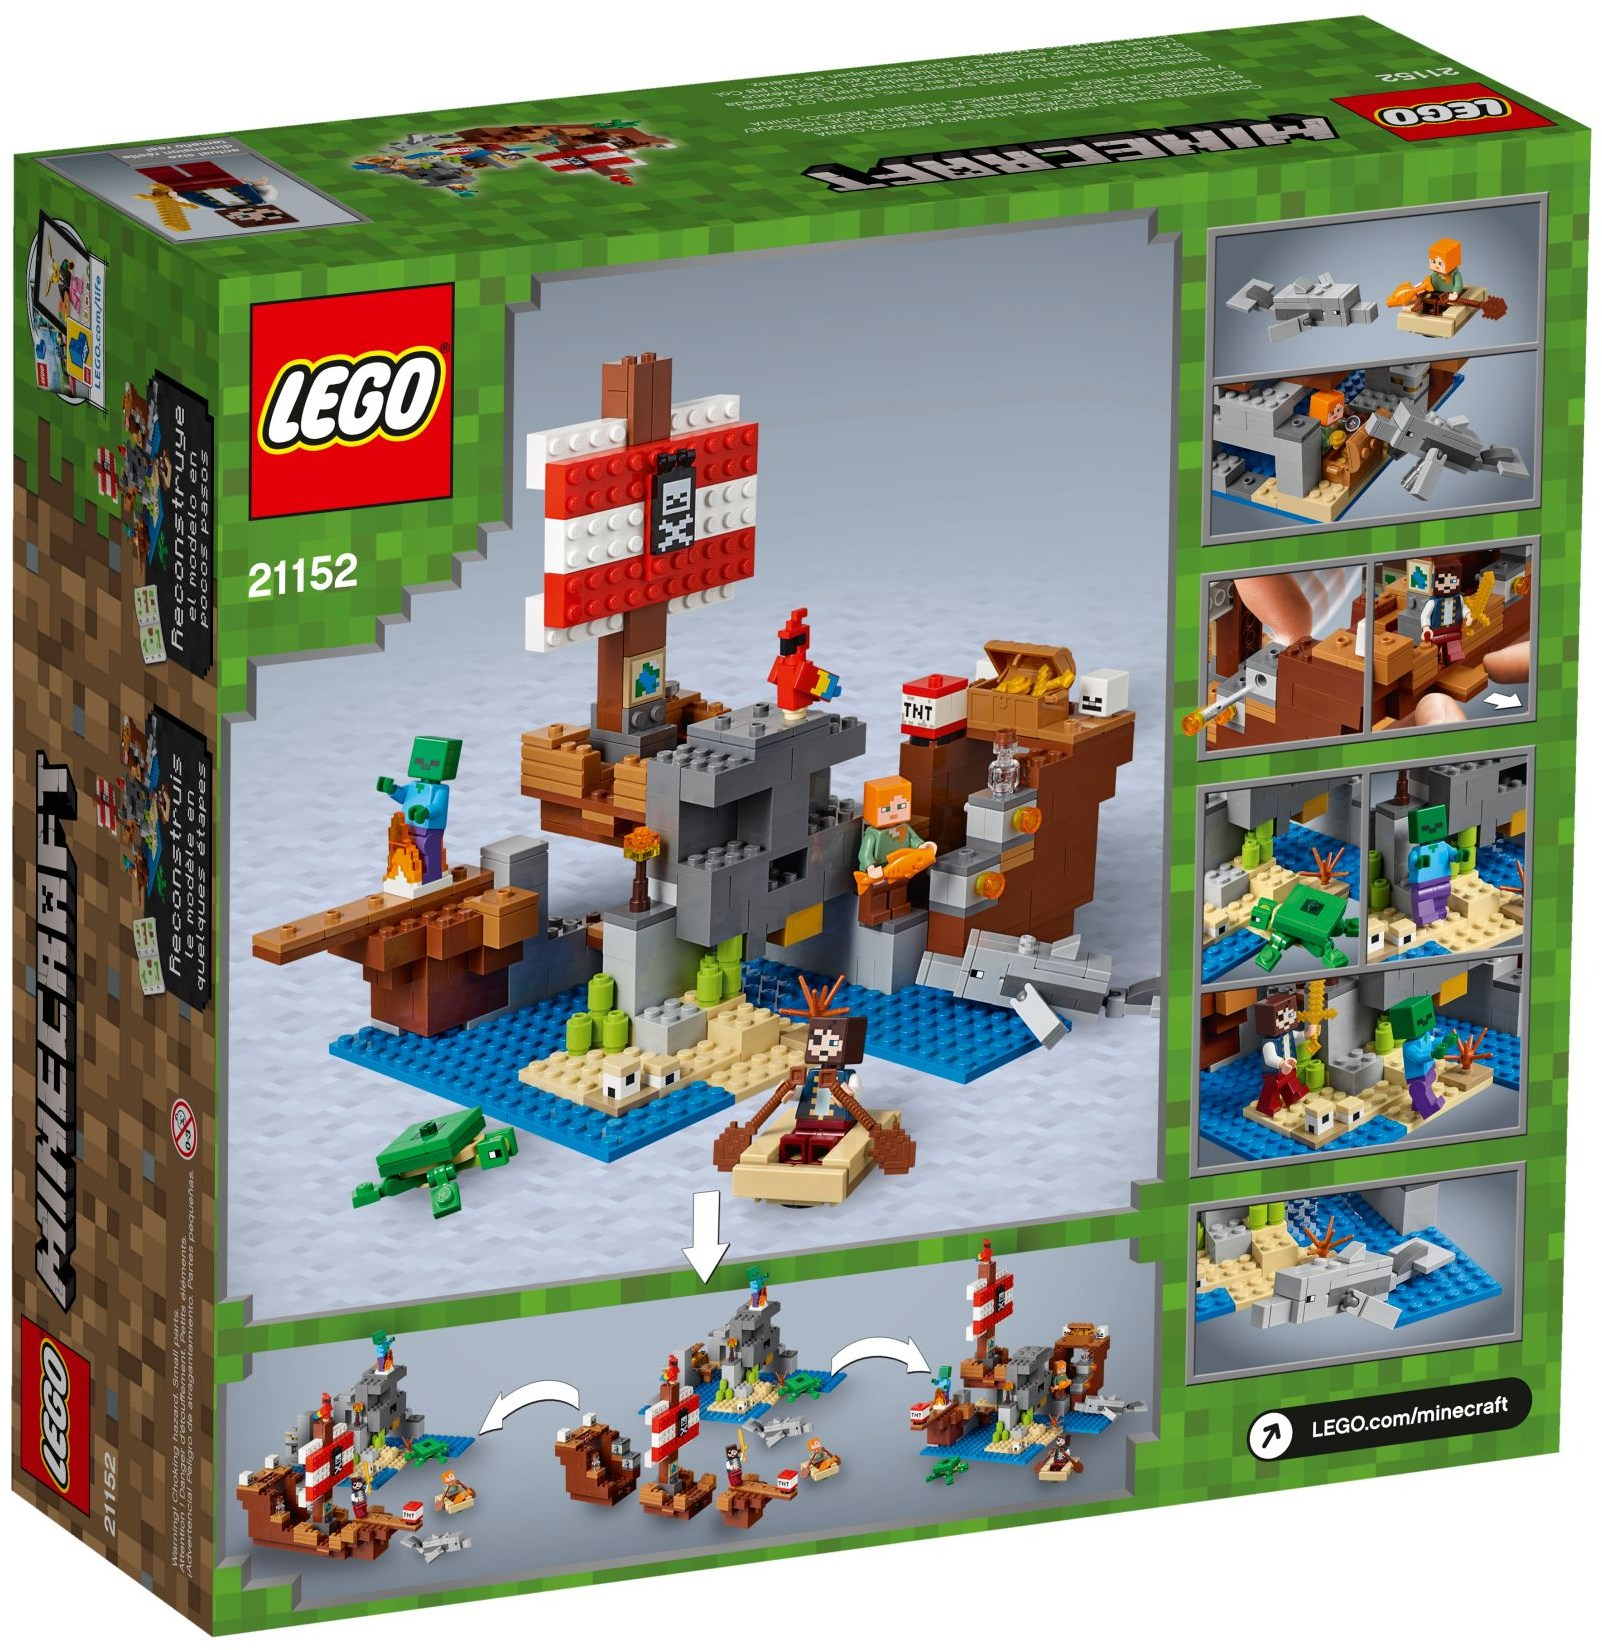 LEGO THE PIRATE SHIP ADVENTURE - 21152